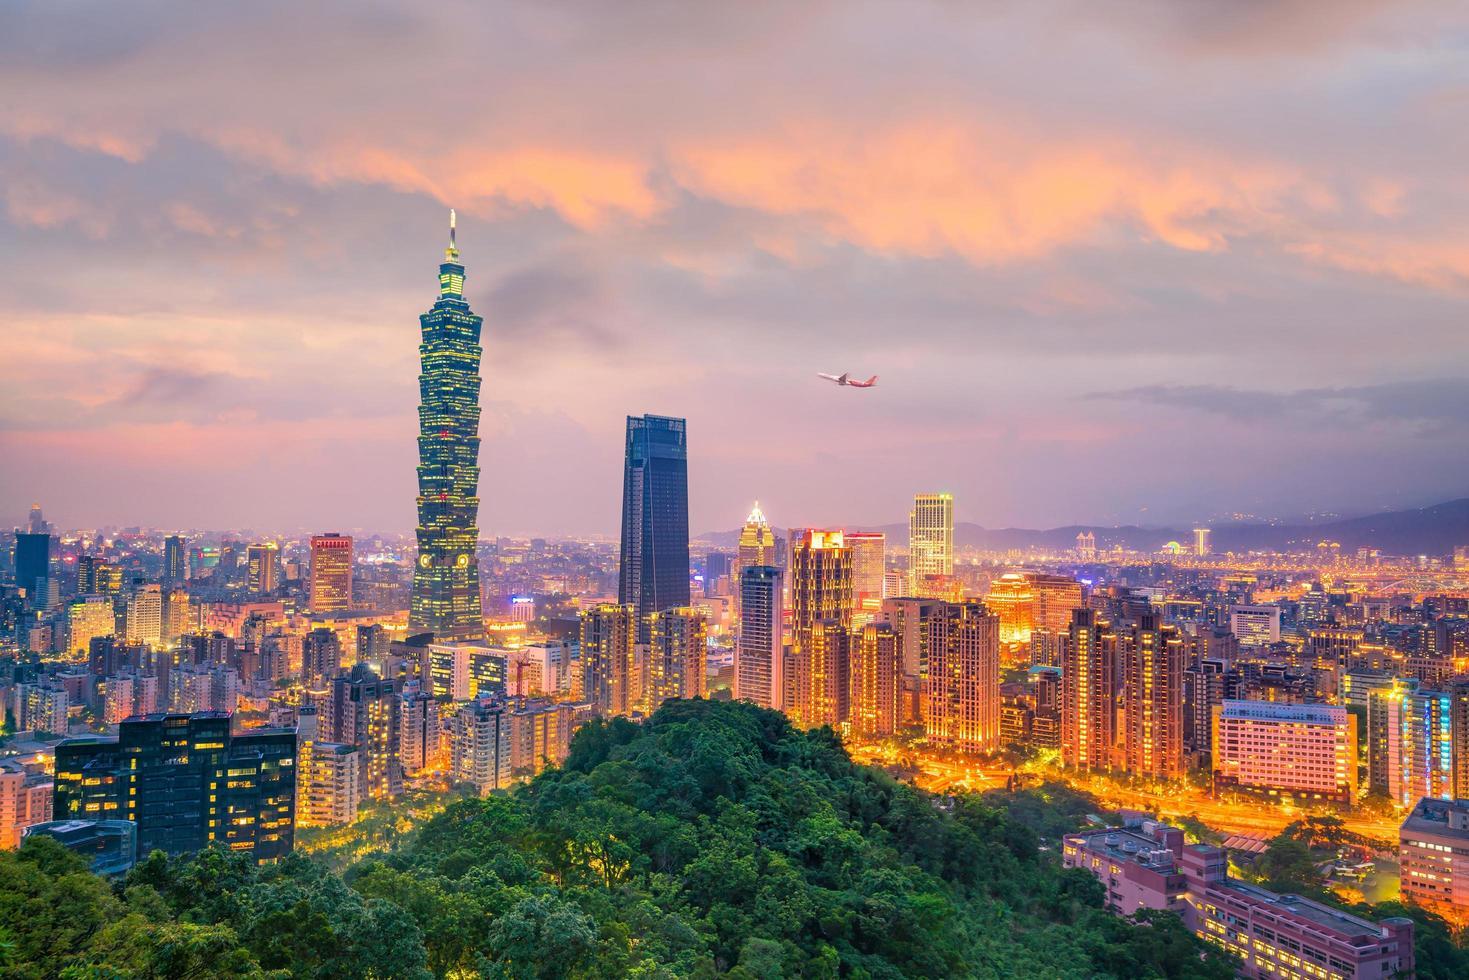 City of Taipei skyline at twilight photo